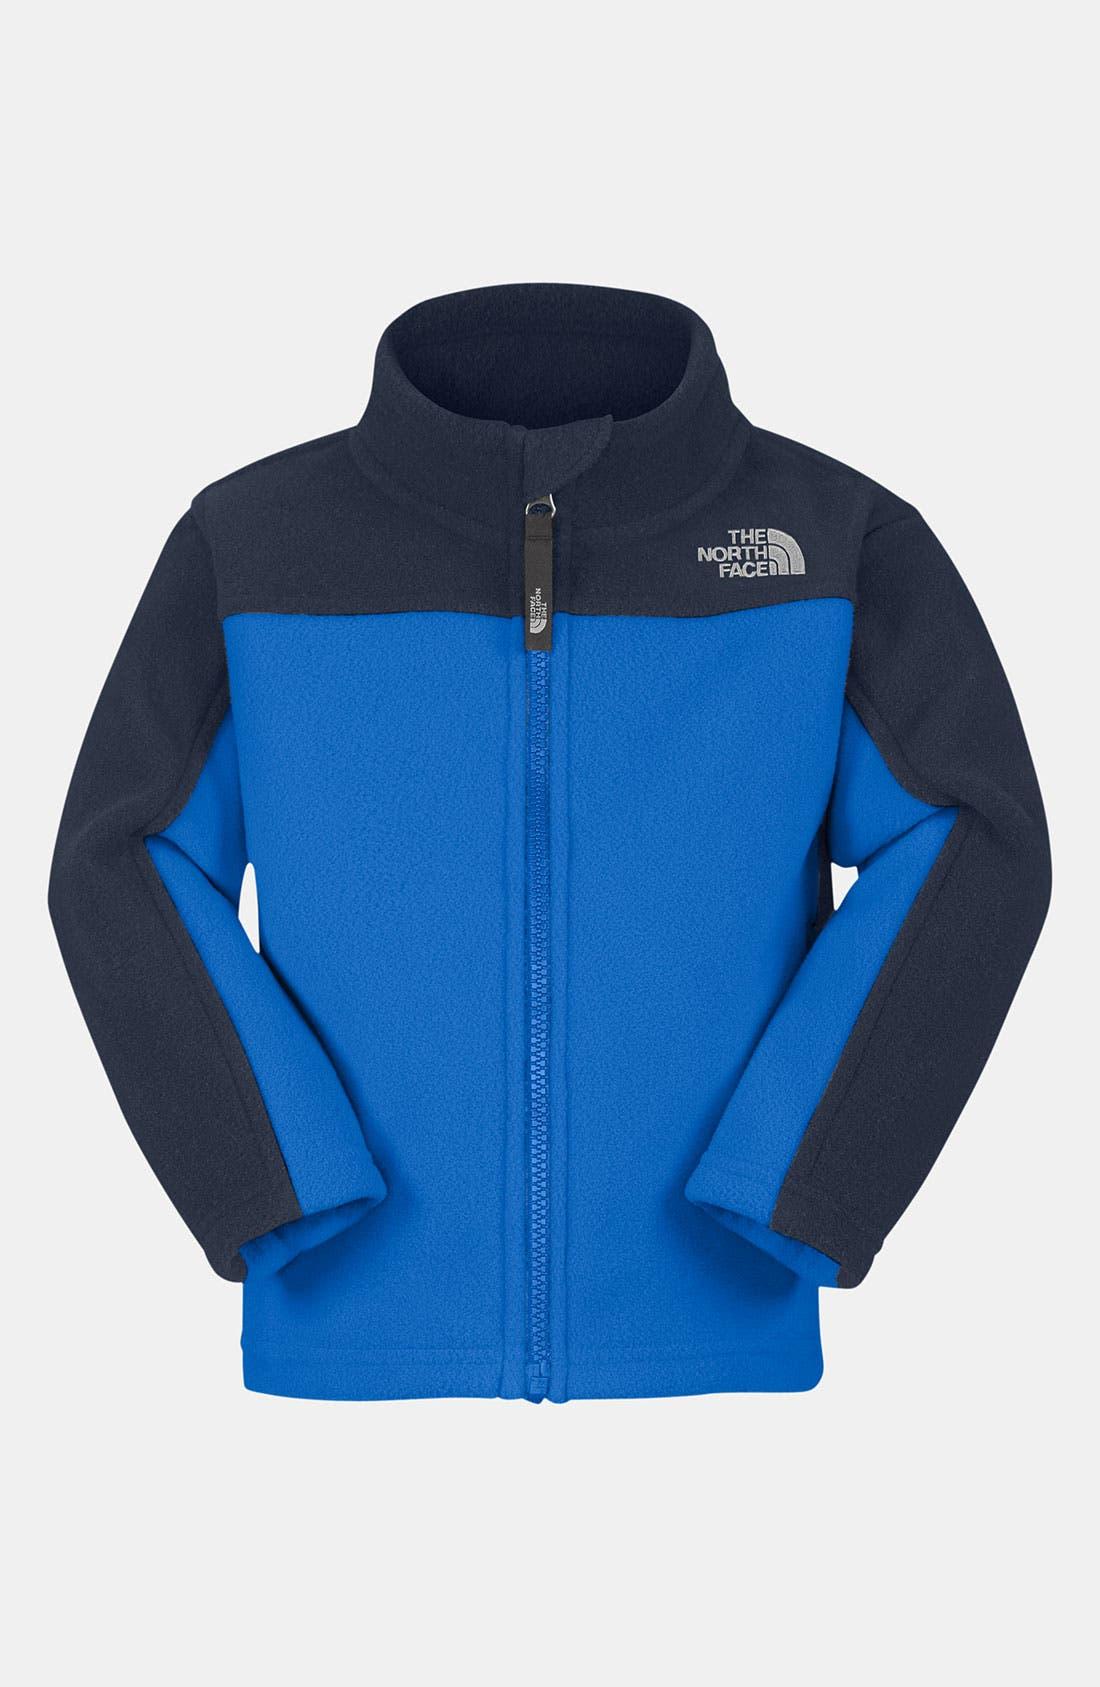 Main Image - The North Face 'Khumbu' Fleece Jacket (Toddler)